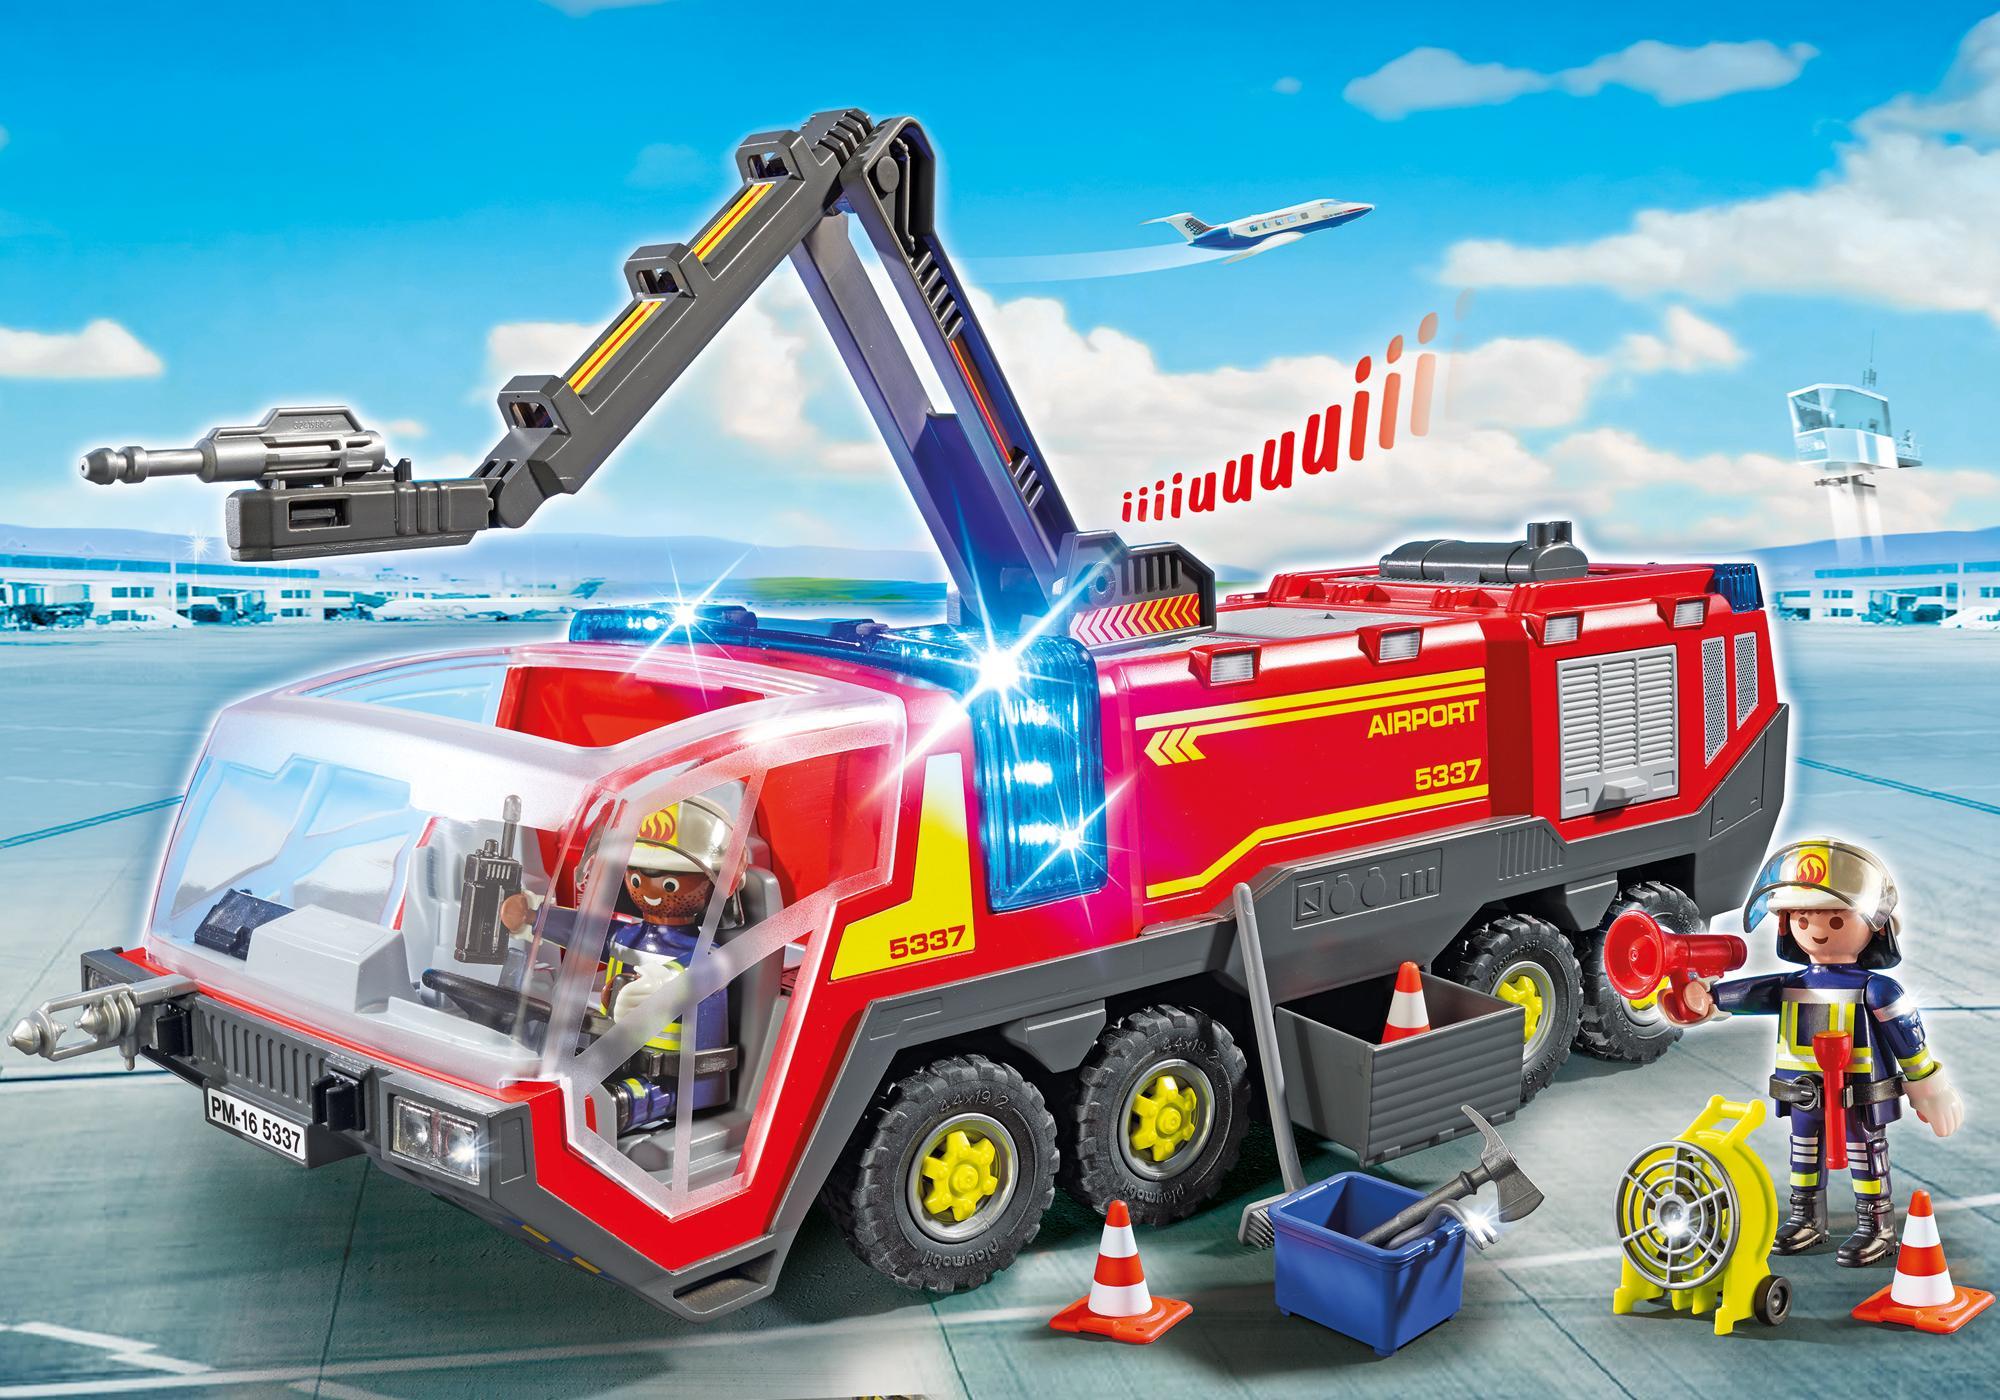 http://media.playmobil.com/i/playmobil/5337_product_detail/Πυροσβεστικό όχημα αεροδρομίου με φώτα και ήχο